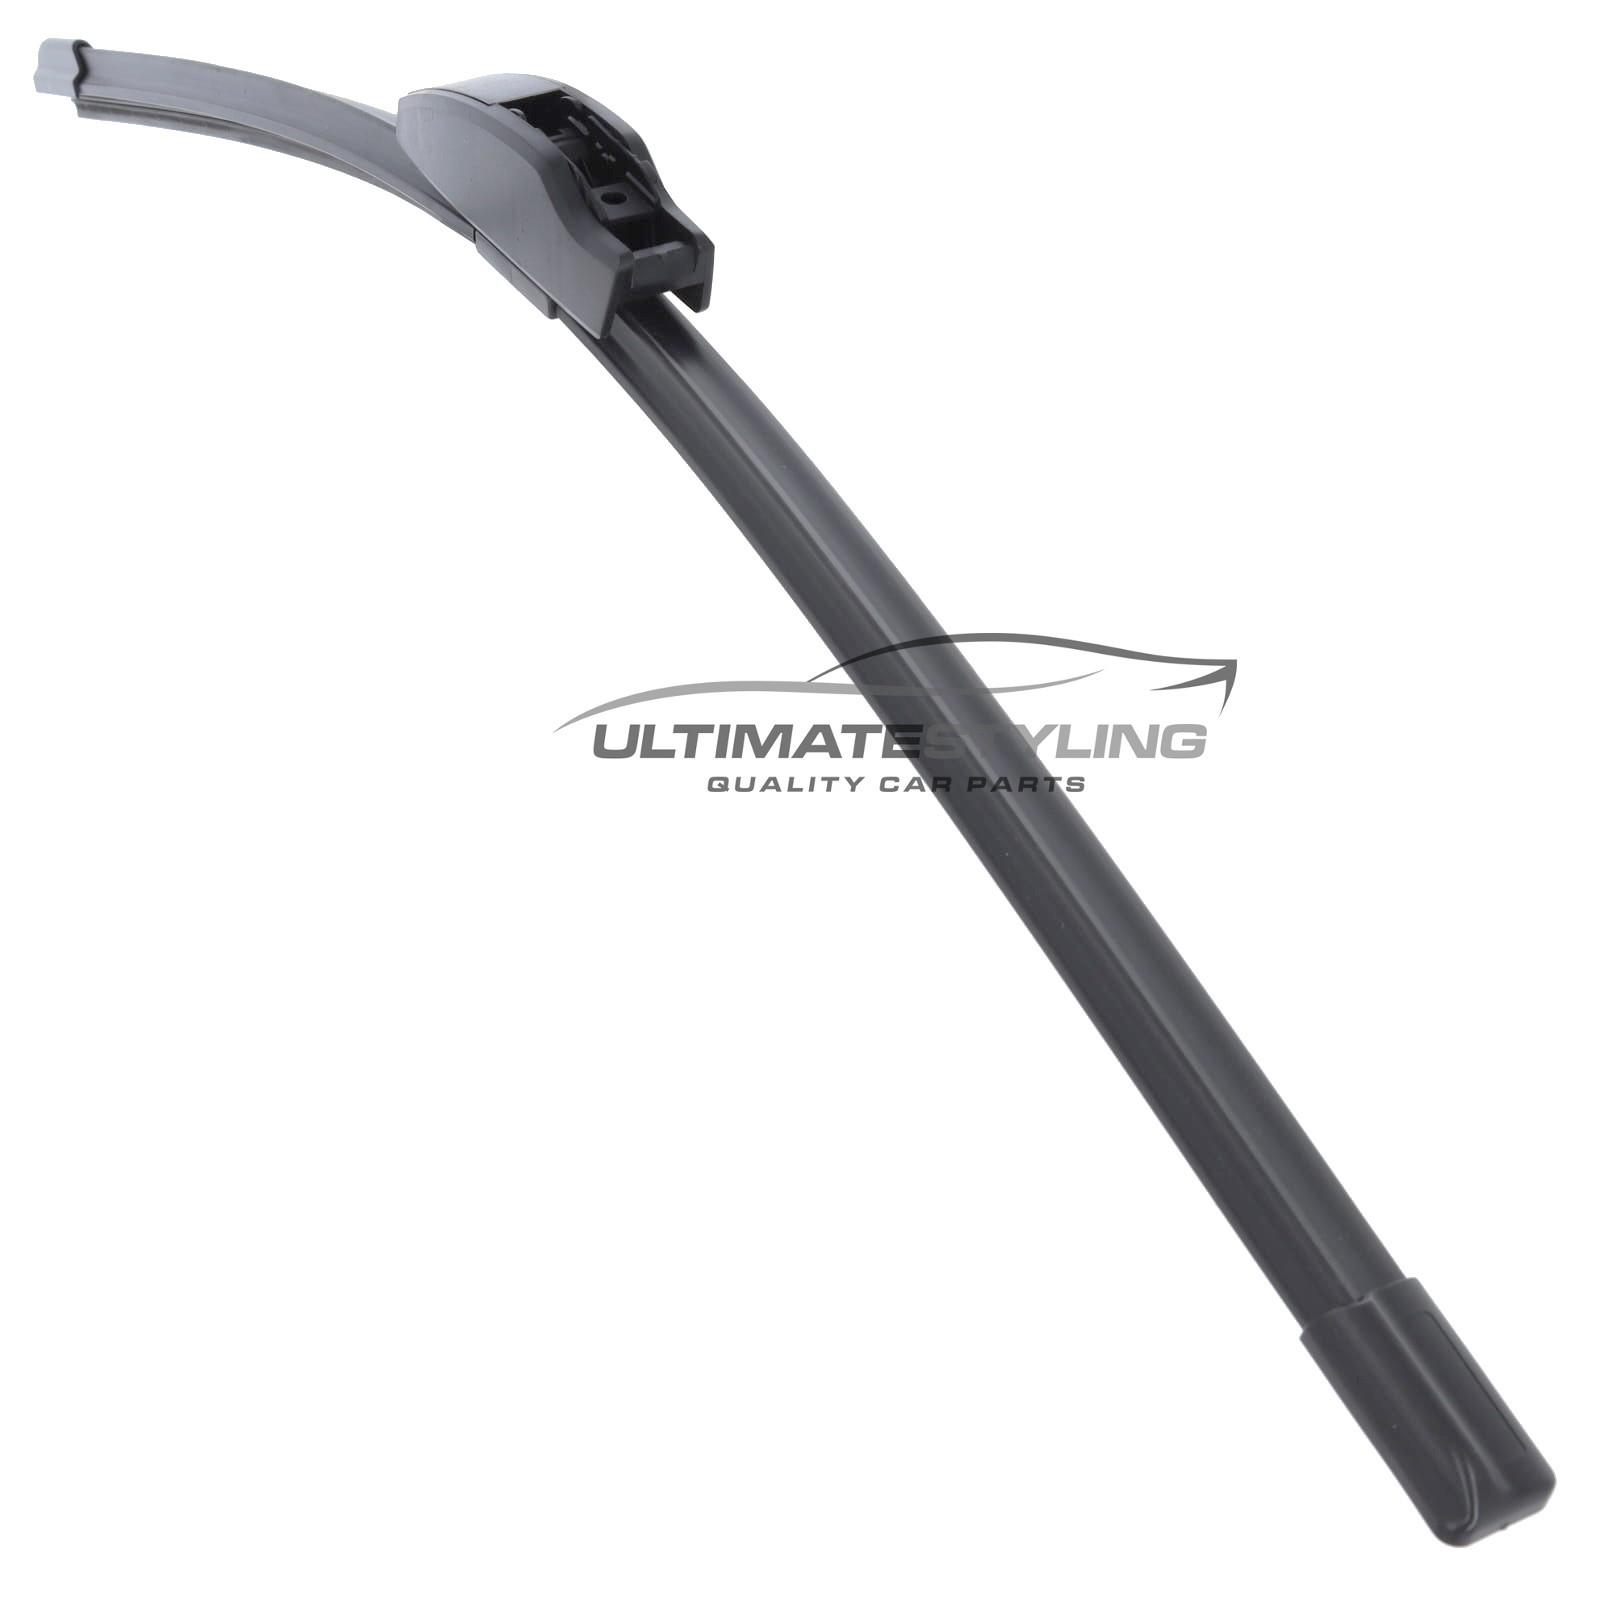 Wiper Blade - Exact Fit Aero Blade - 53 cm - 21 inch - Multi Fitment